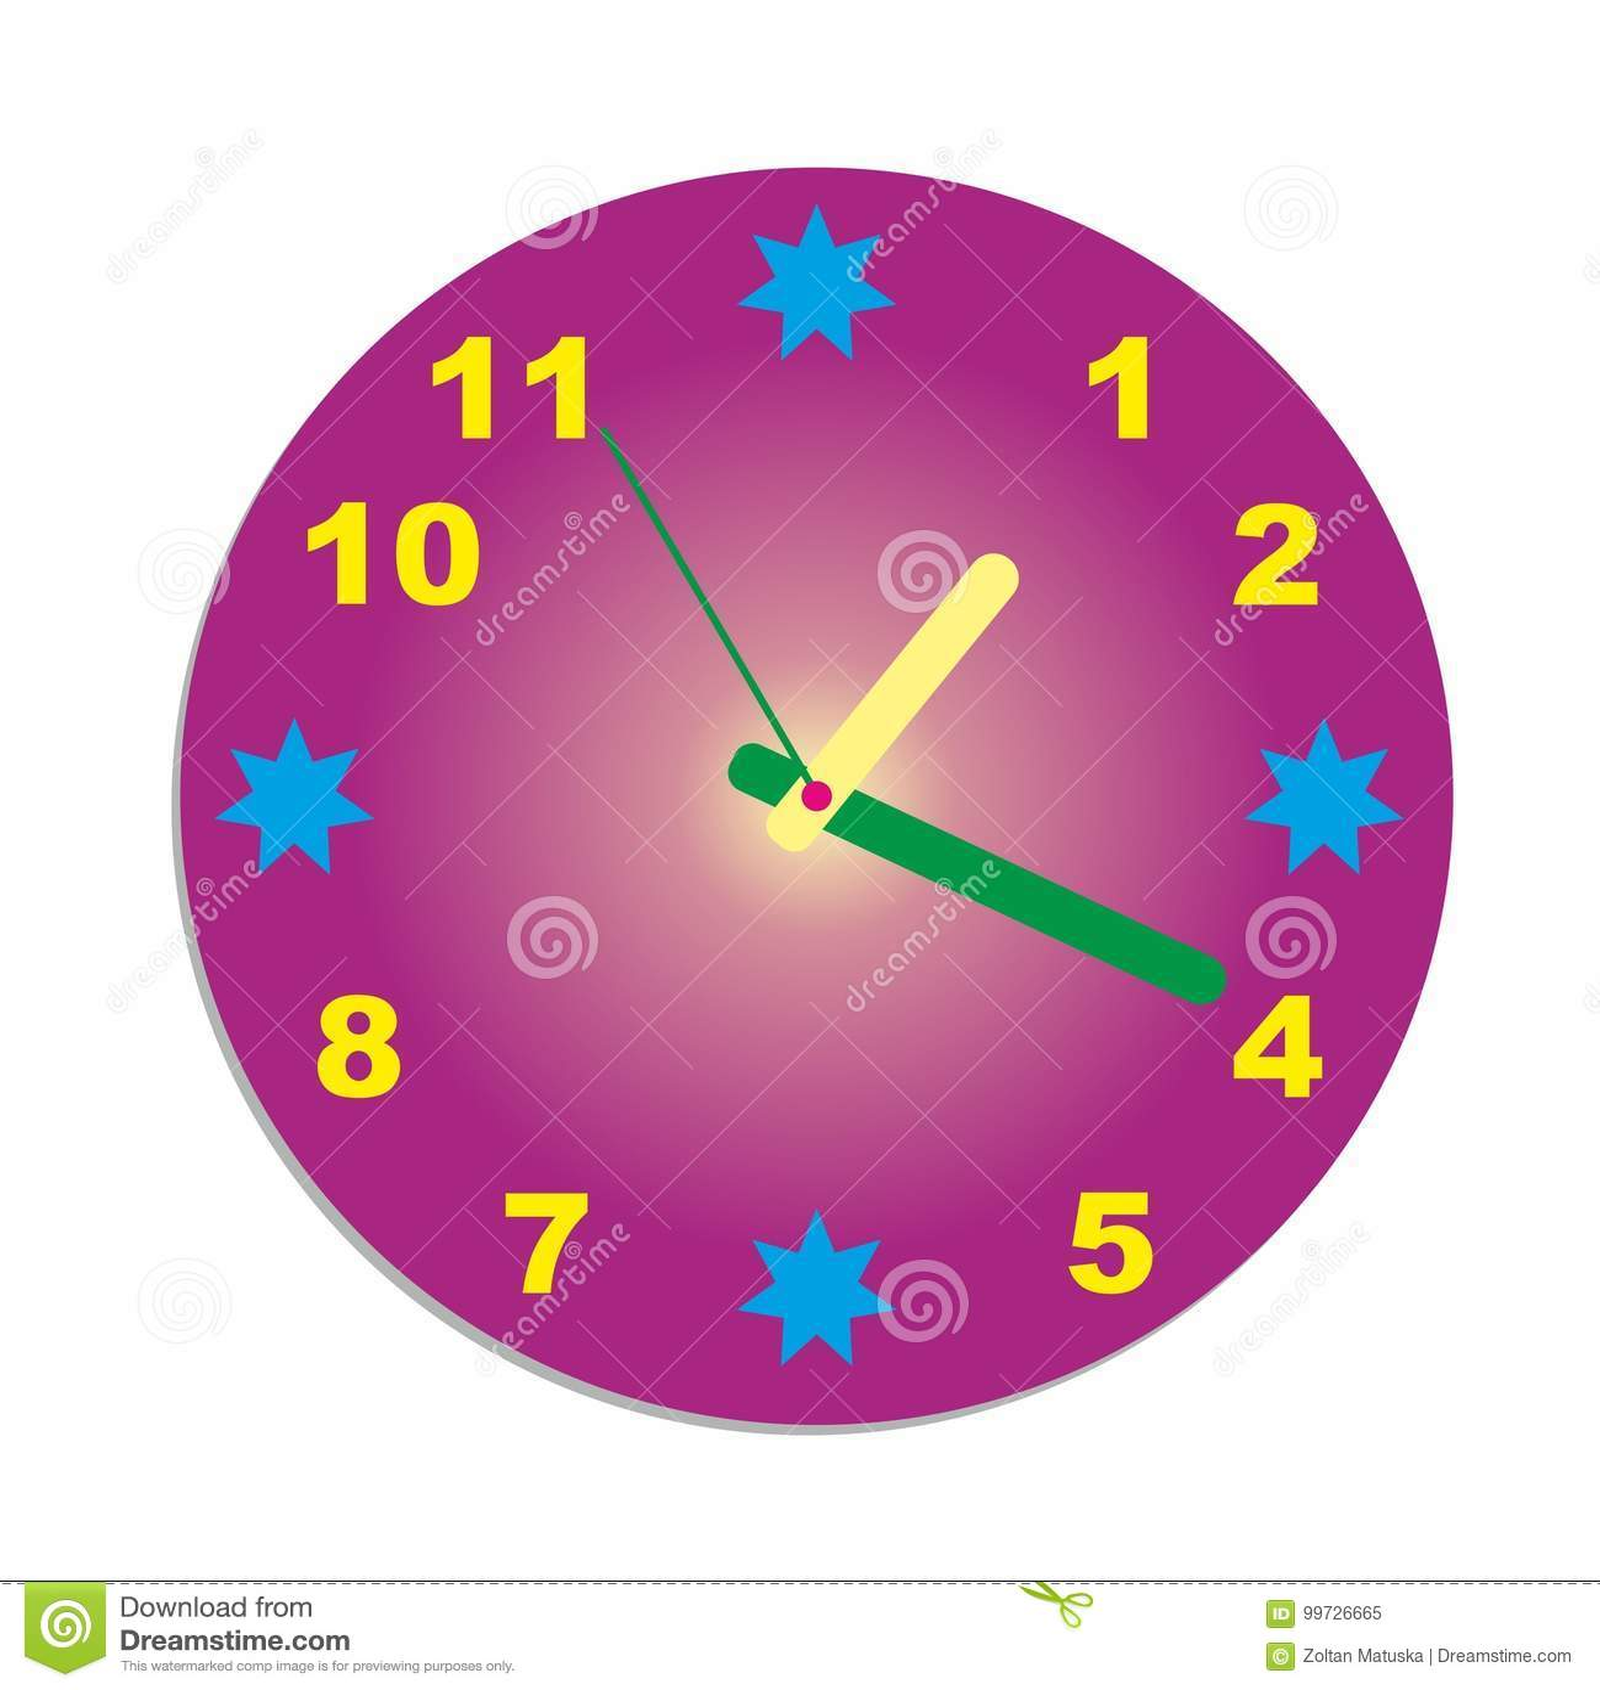 f8e837139ac Vetor azul da forma do círculo do relógio colorido do conceito do pulso de  disparo de parede